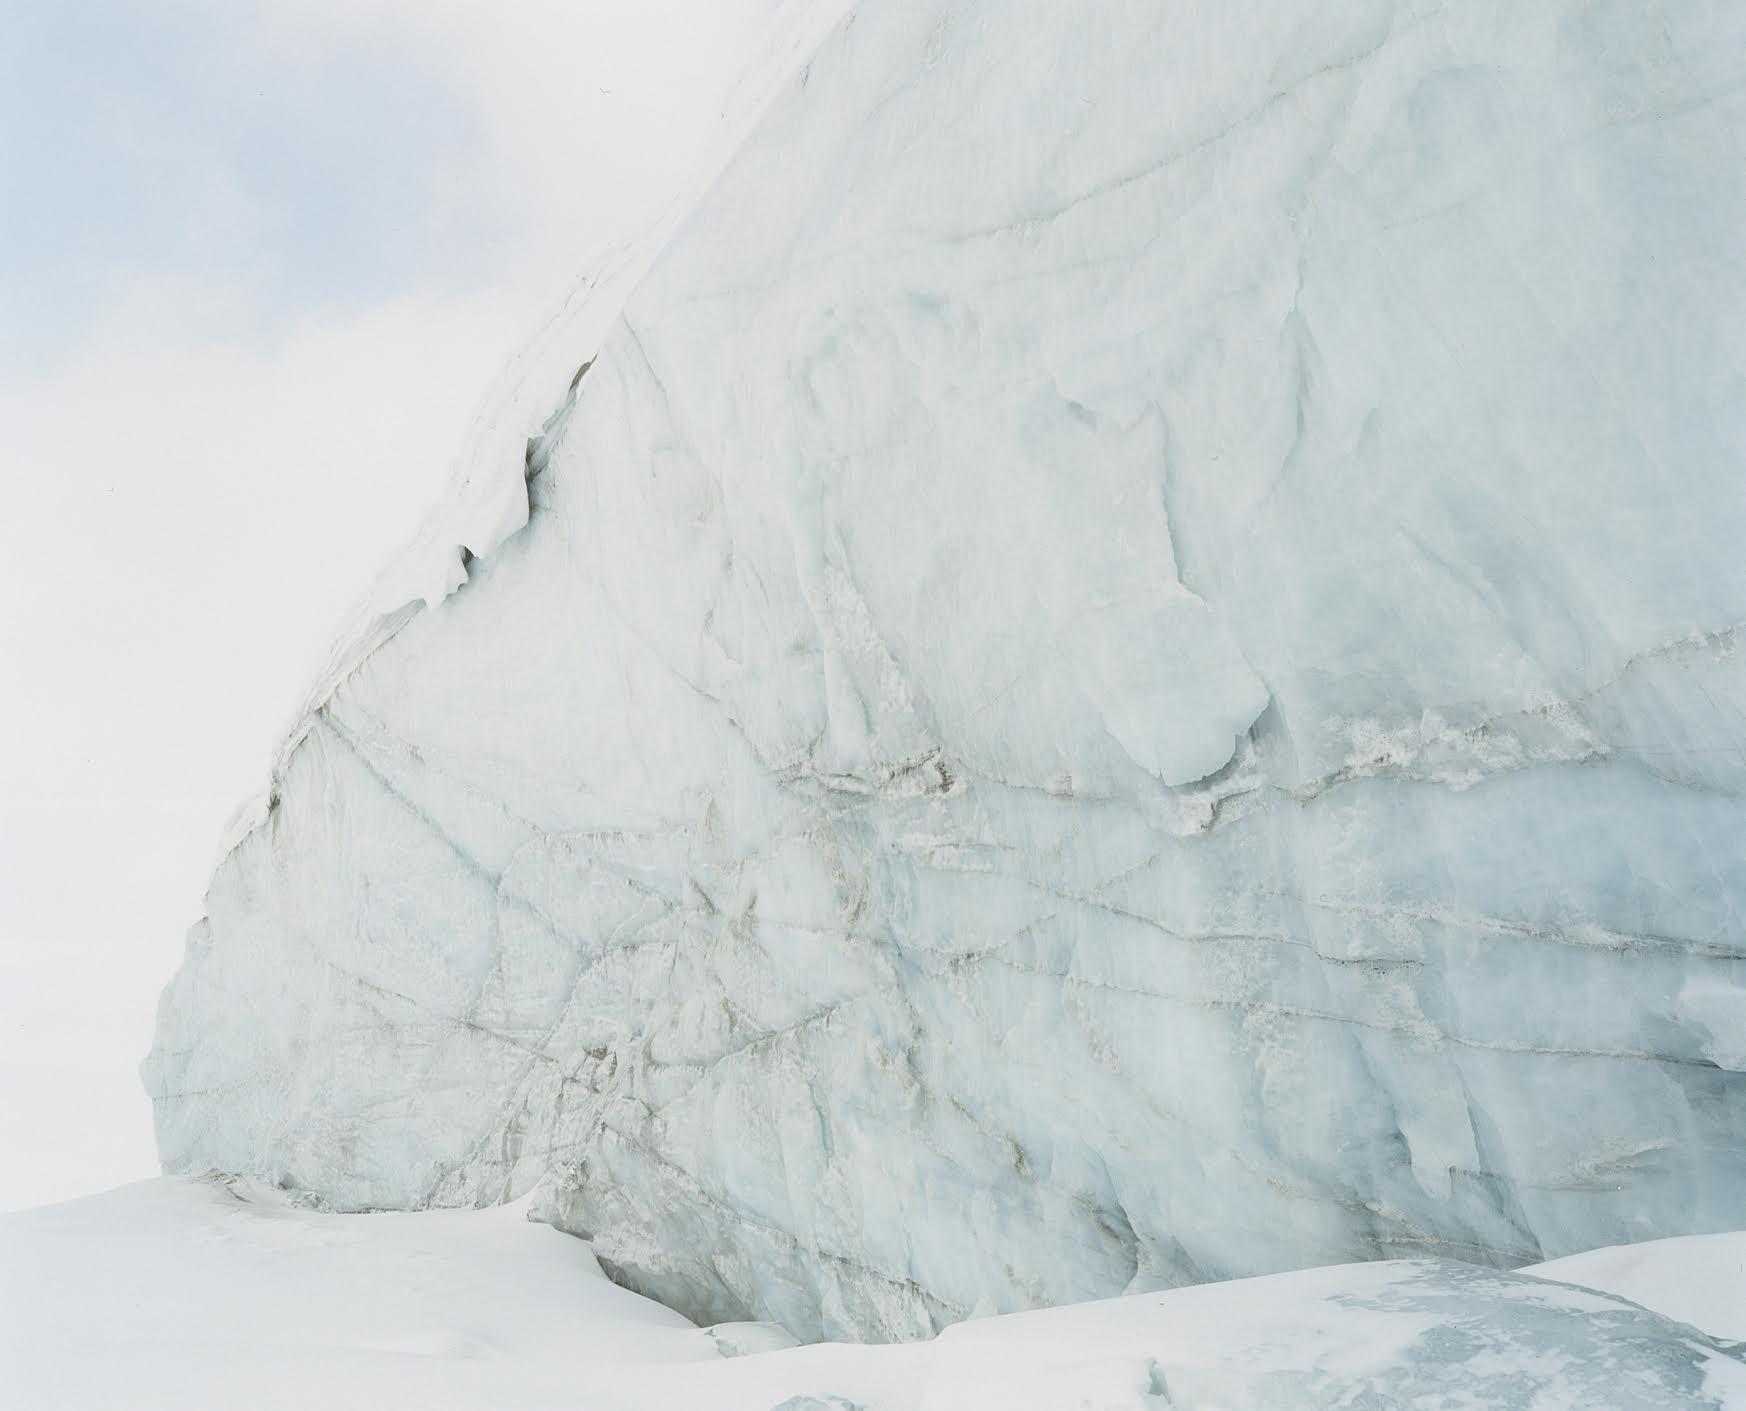 Naoki IshikawaIceberg / Svalbard #12007 73 x 90 cm (image size)C-print